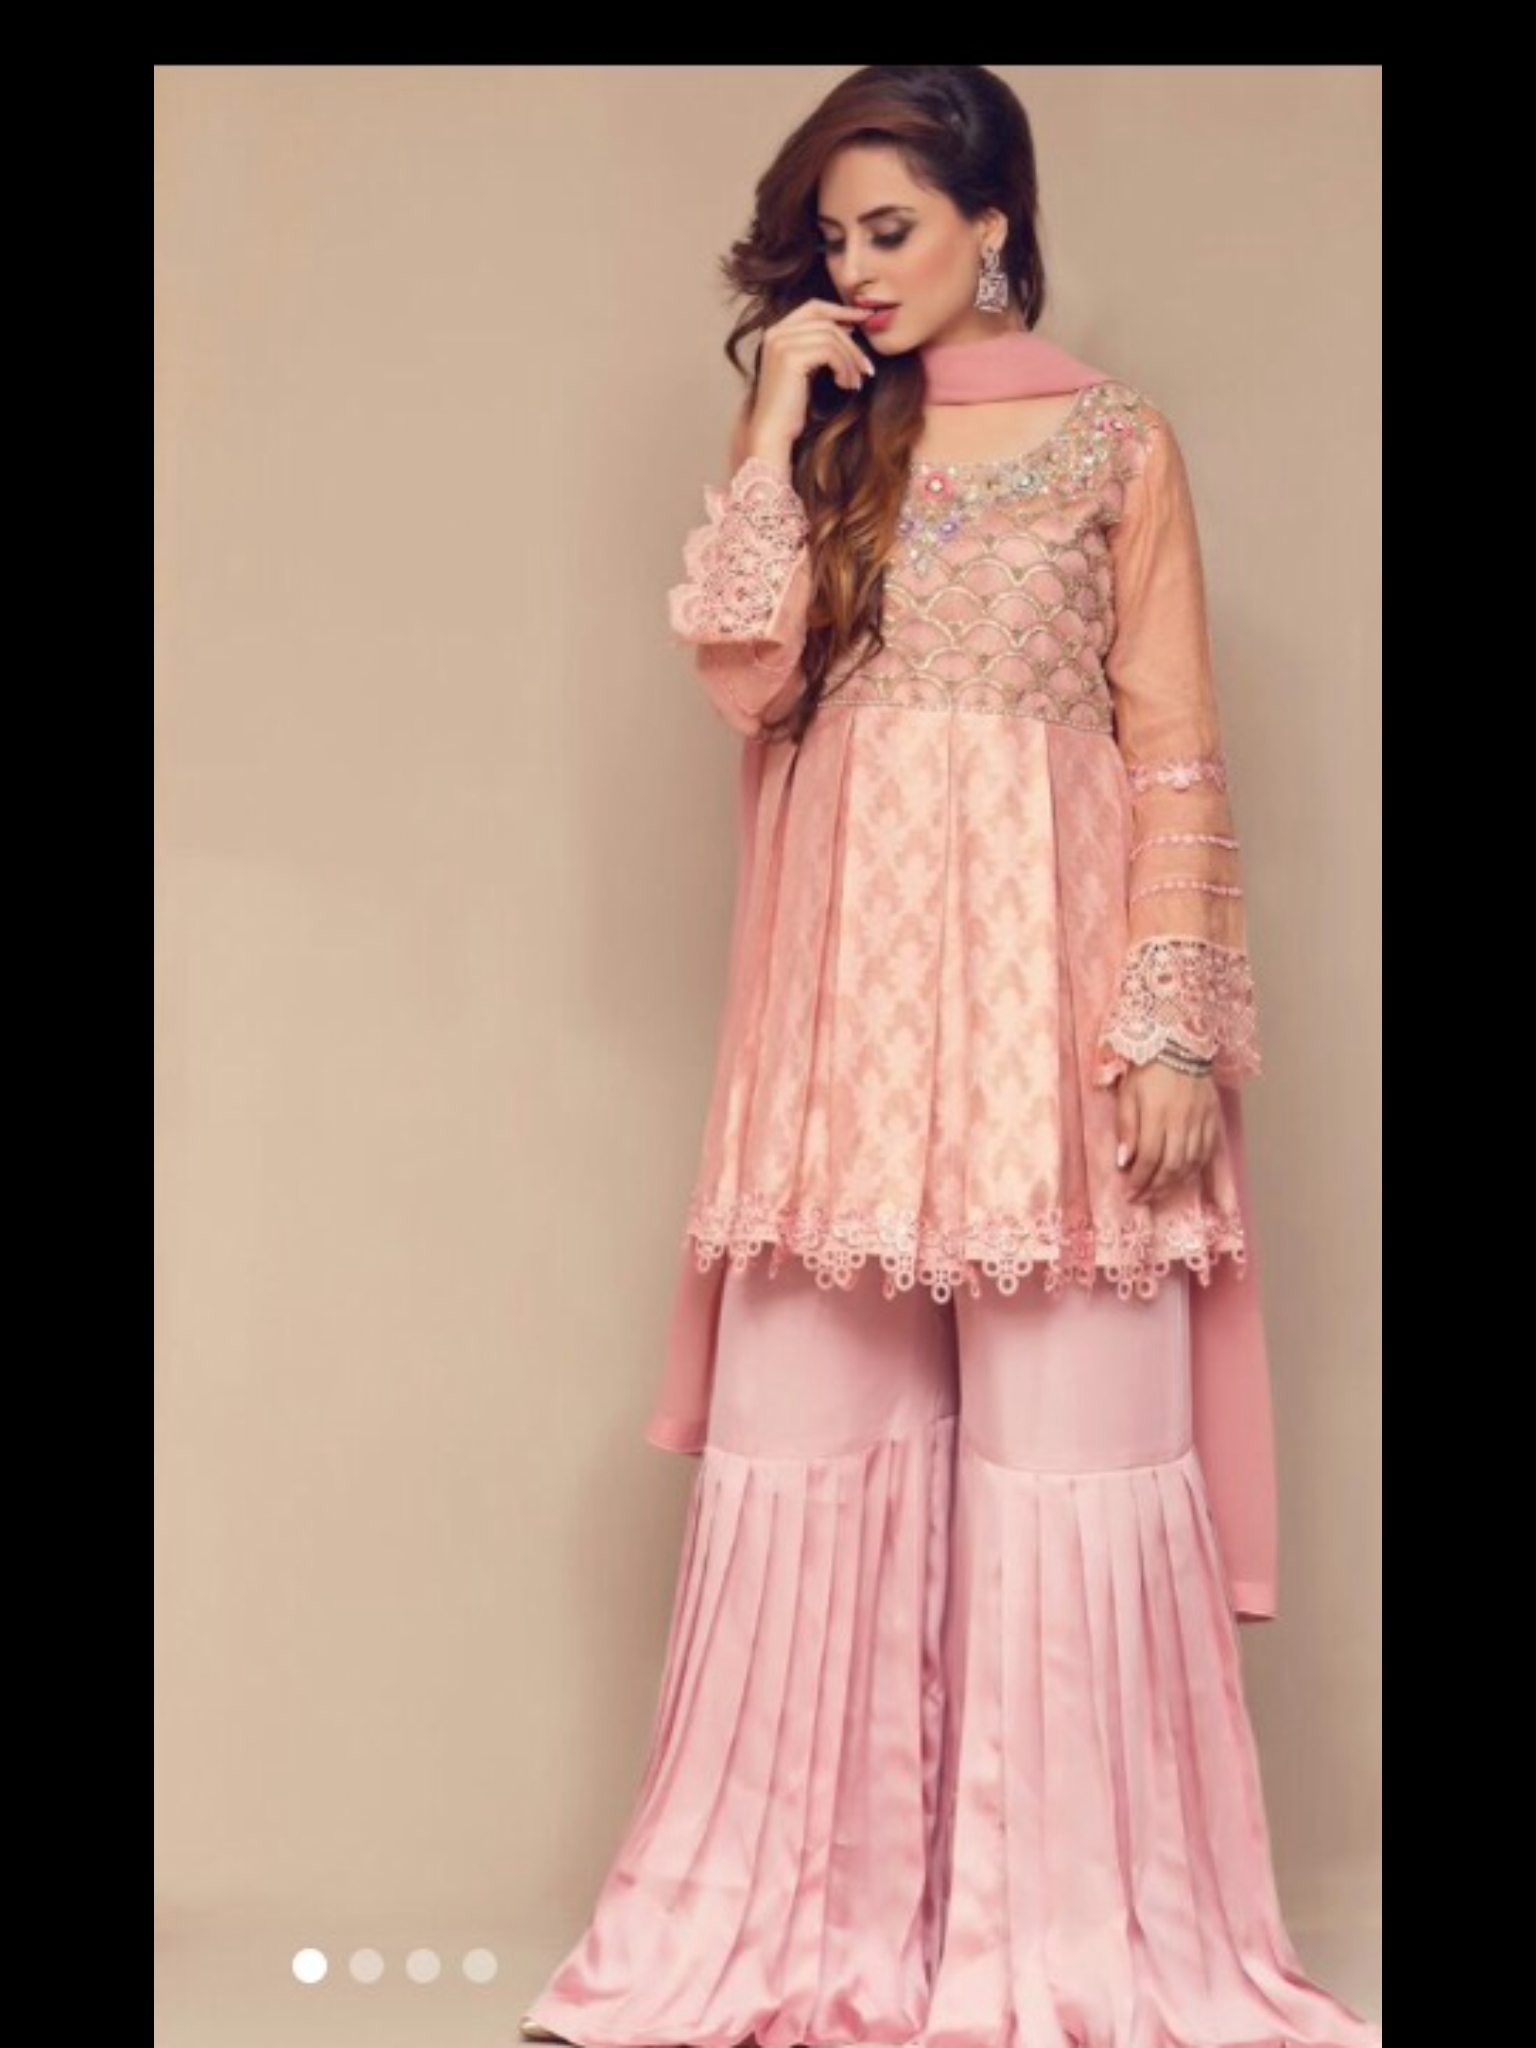 Pin de Rowaida en Pakistani clothing | Pinterest